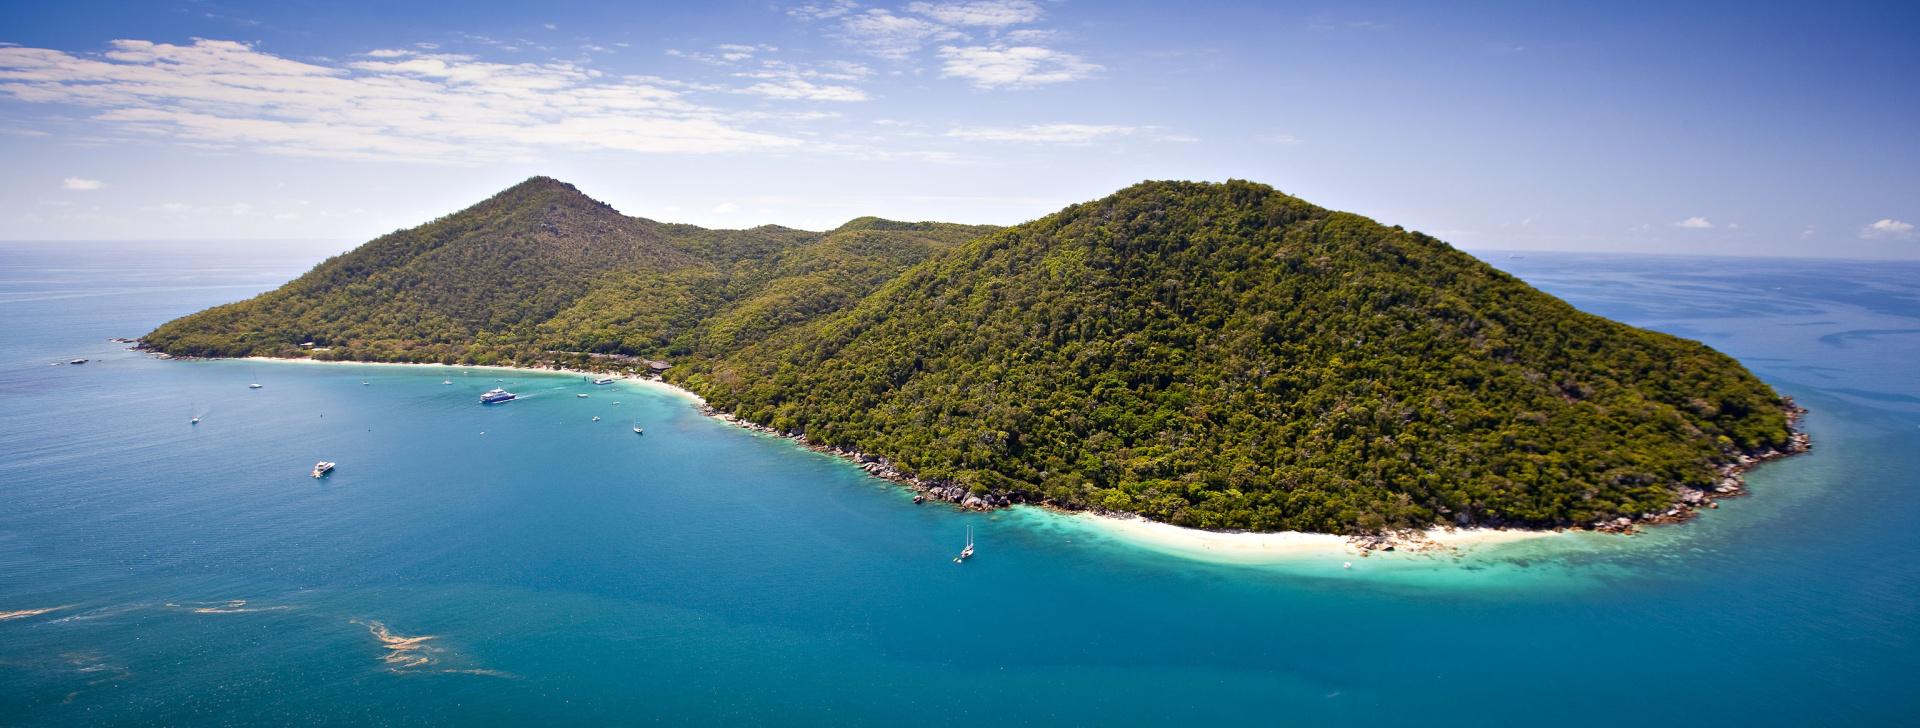 Fitzroy Island Resort Cairns Tourism Town Find